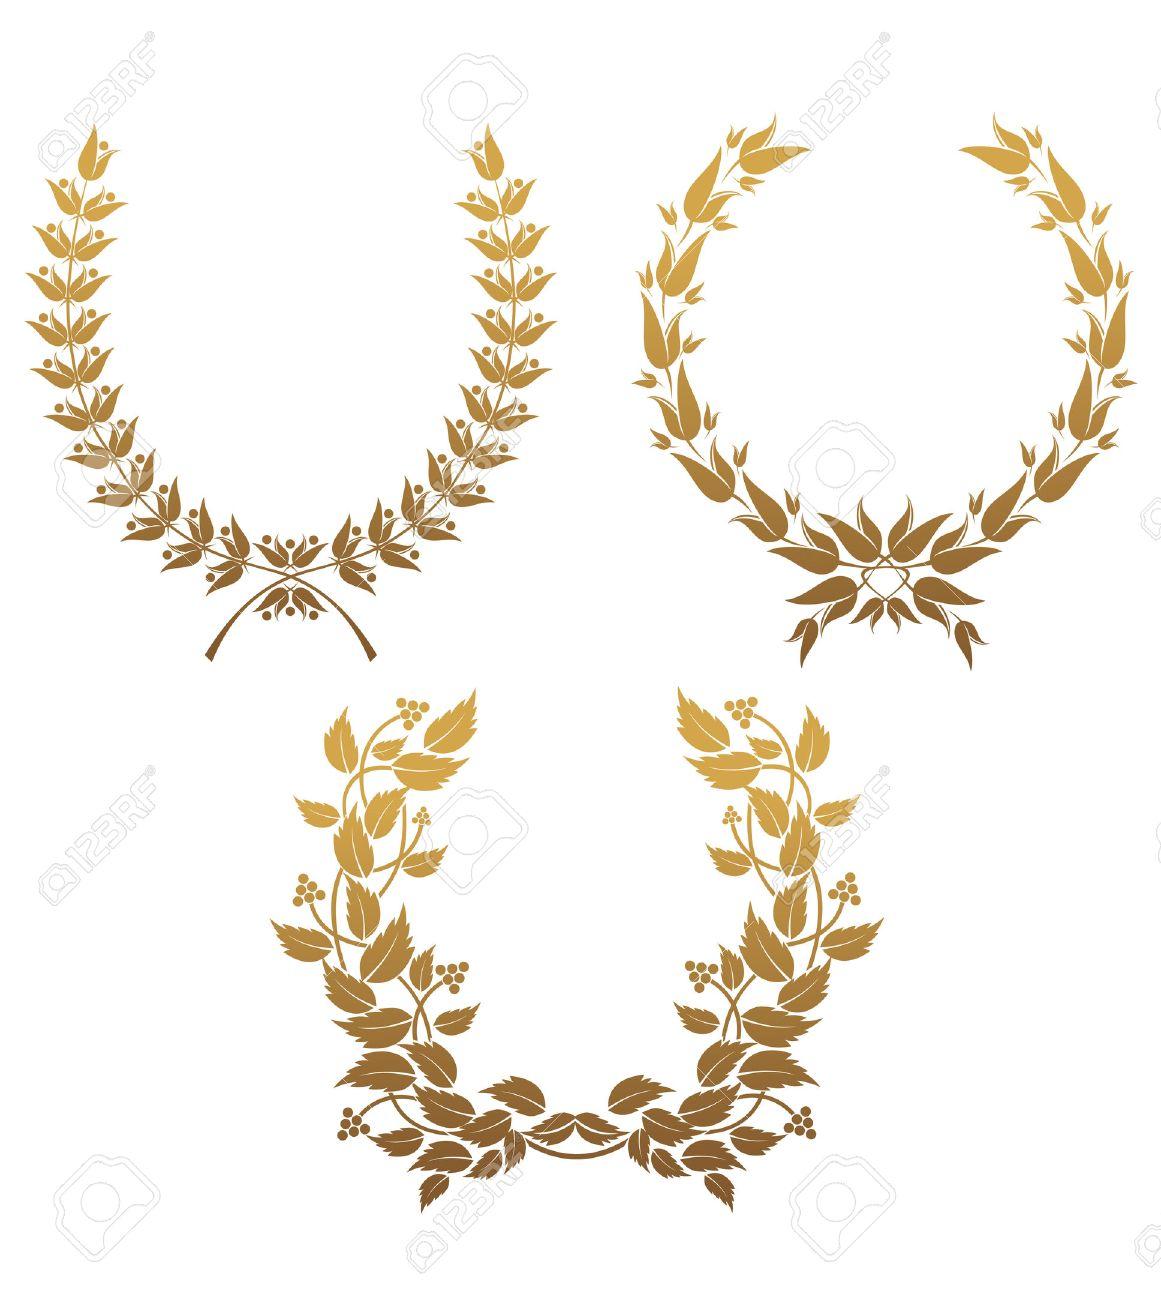 Set of gold laurel wreaths for design Stock Vector - 6554178